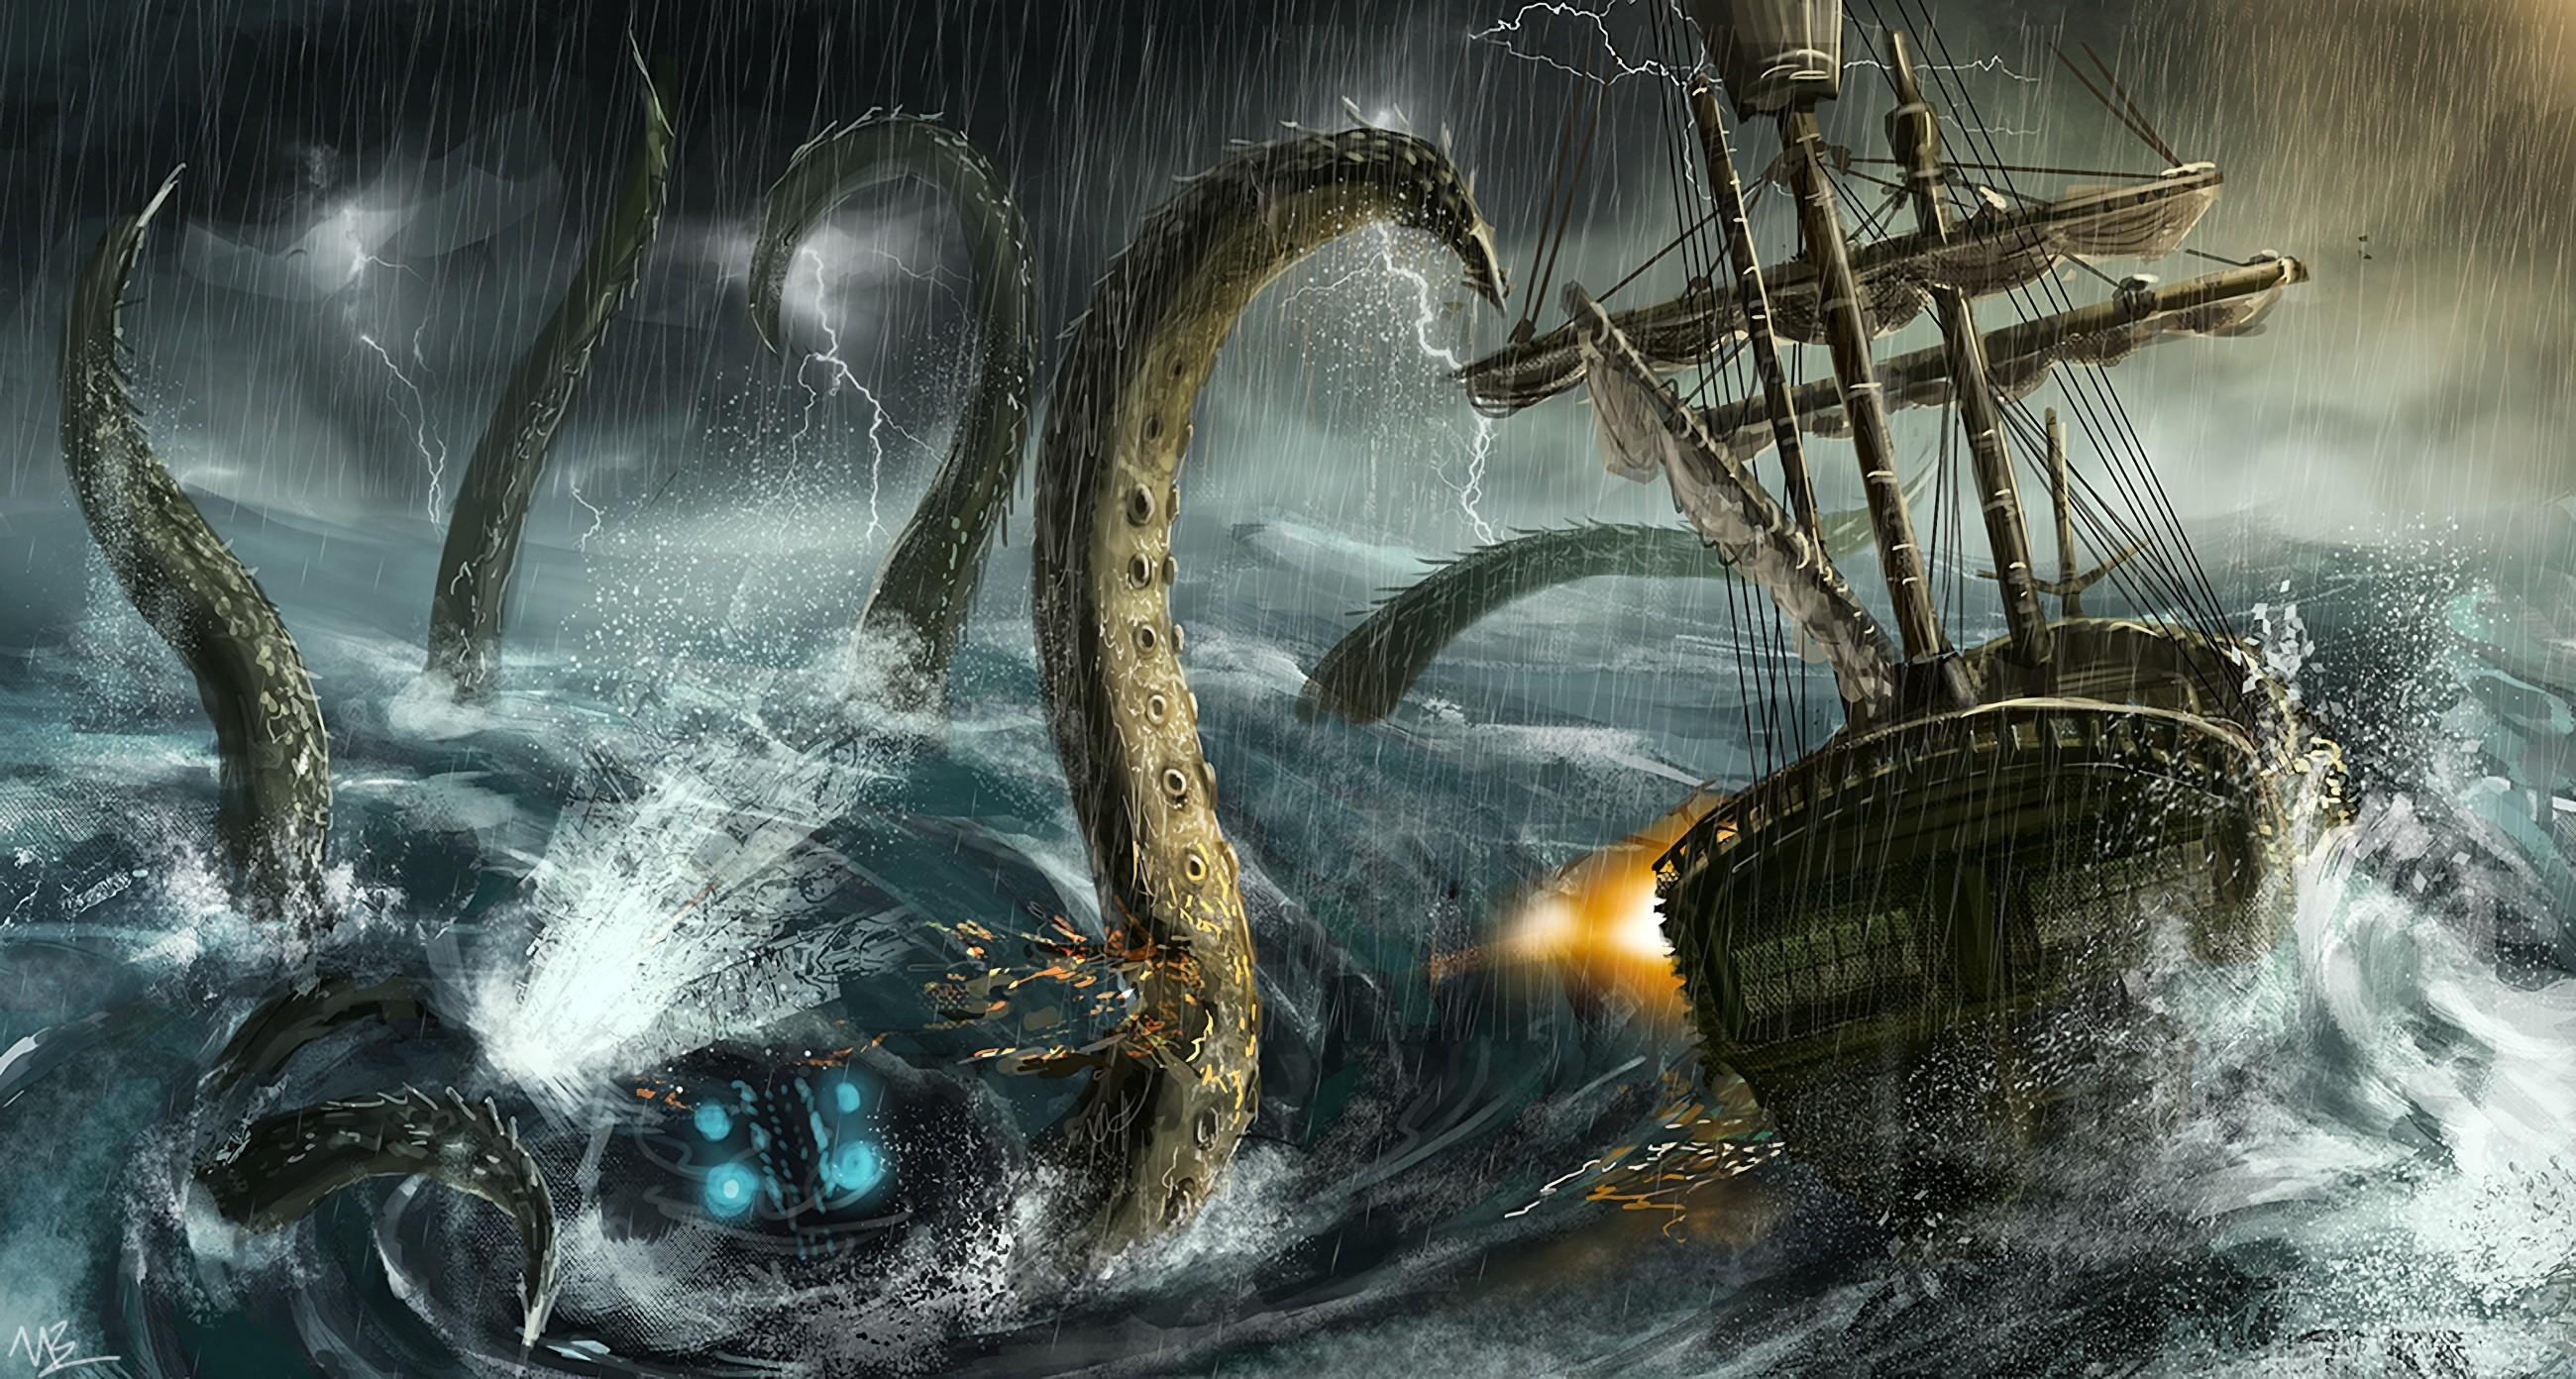 3d Floor Wallpaper Online Wallpaper Sea Monsters Sailing Ship Fantasy Art